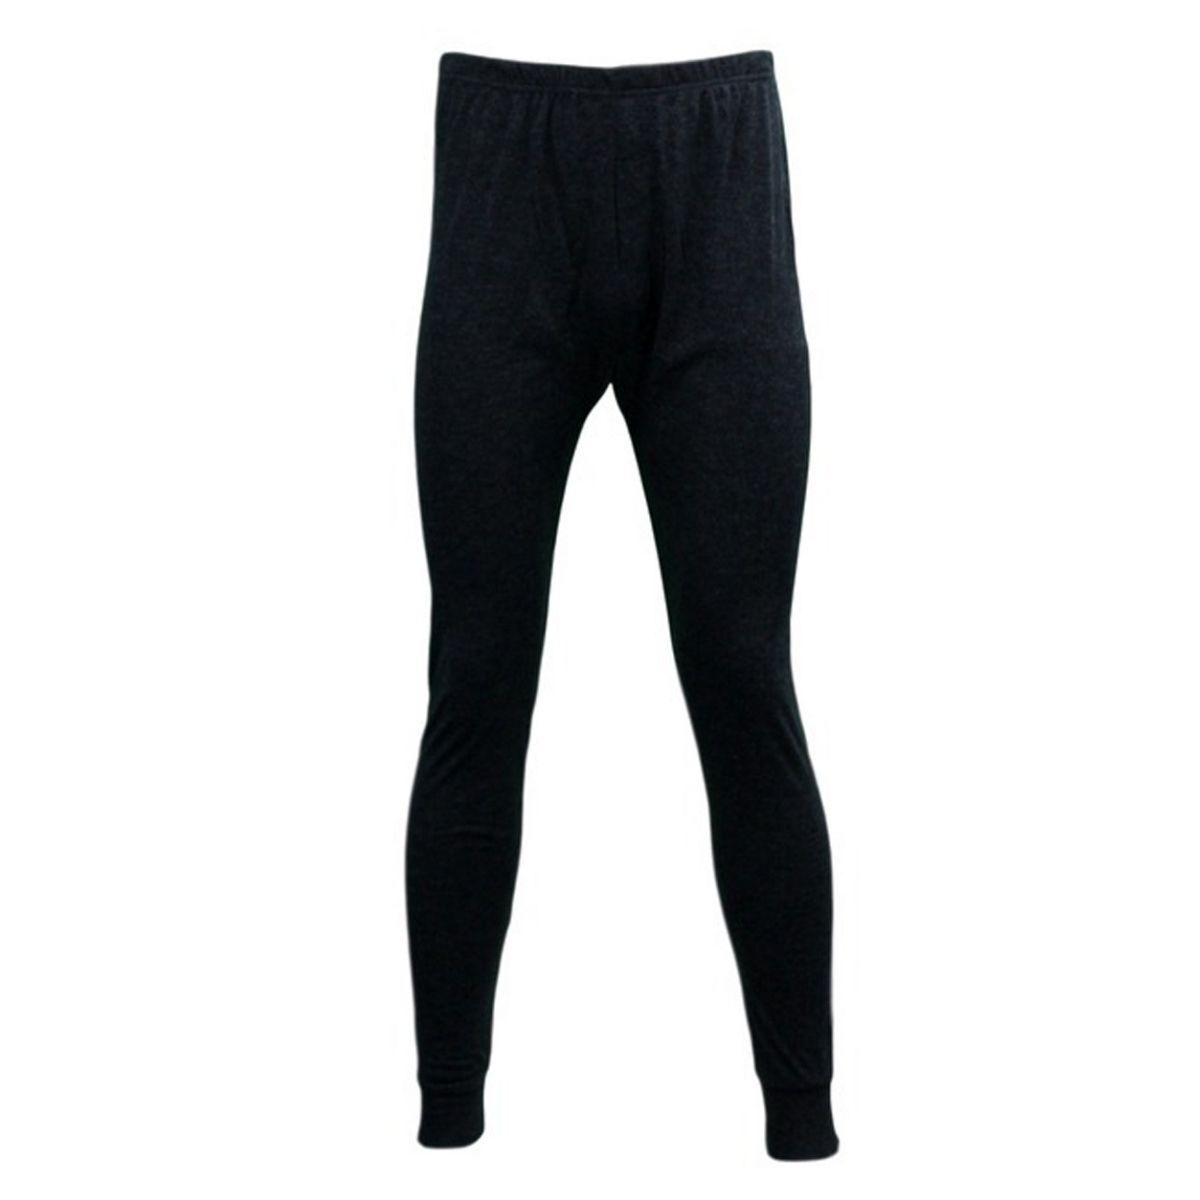 Men-039-s-Merino-Wool-Blend-Long-Sleeve-Thermal-Top-Pants-Long-Johns-Underwear-S-2XL thumbnail 16